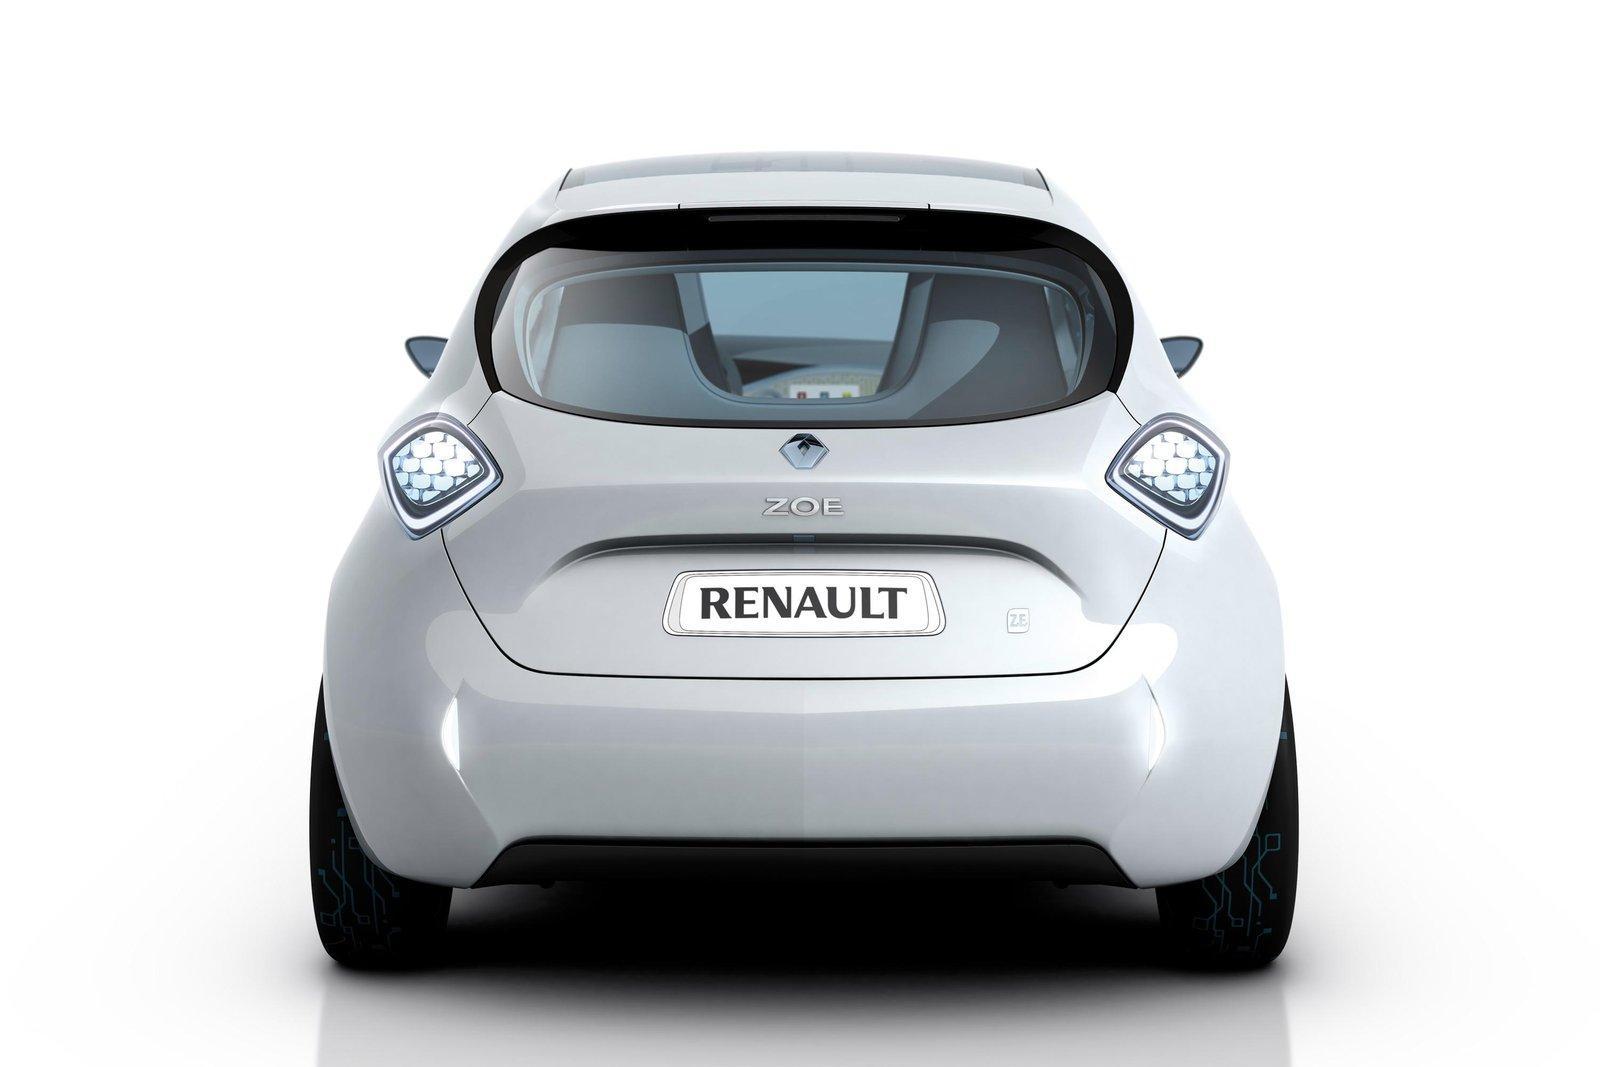 Renault Zoe Picture 43217